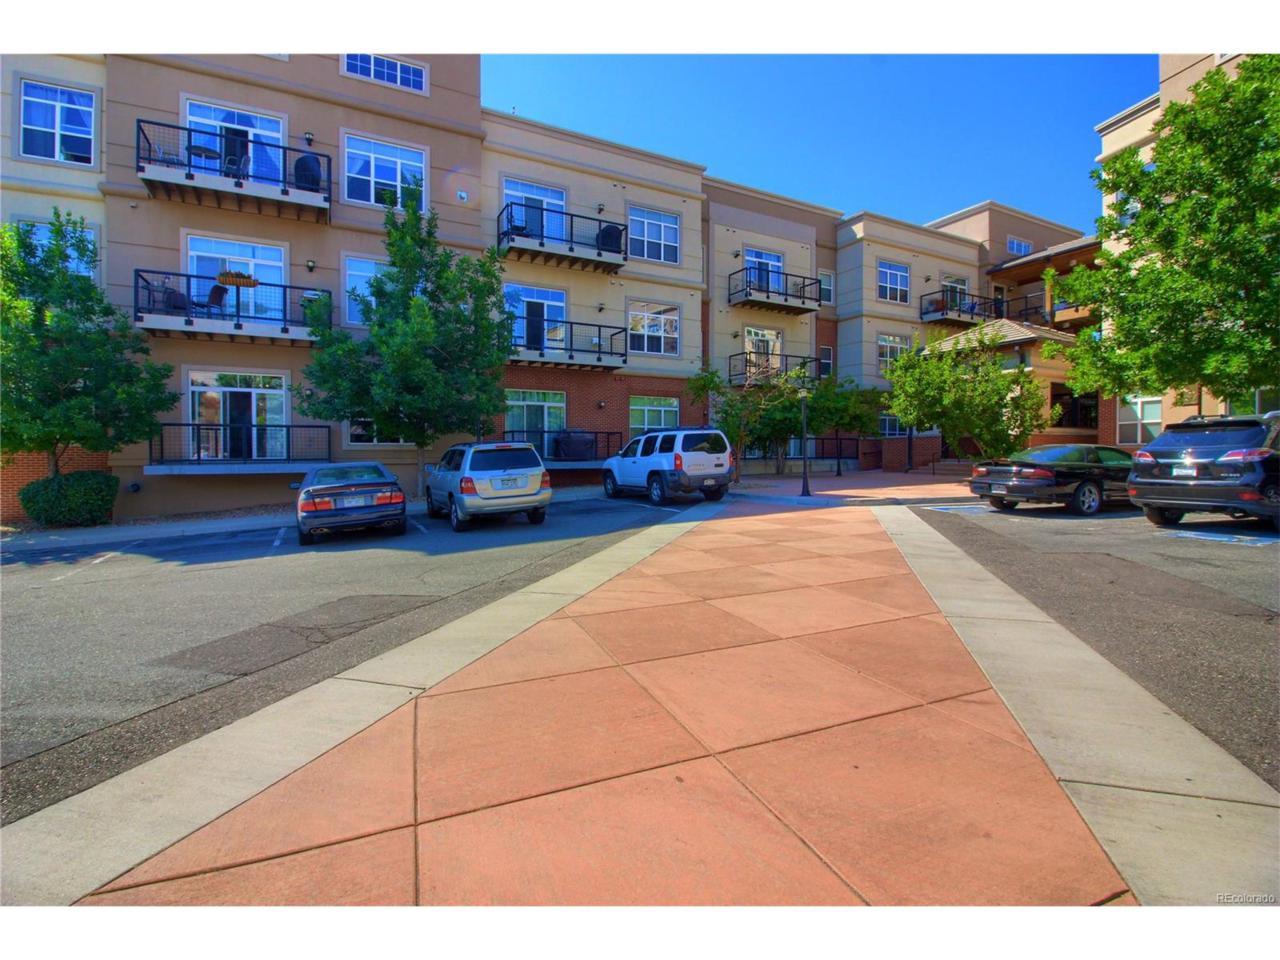 5677 S Park Place 308A, Greenwood Village, CO 80111 (MLS #4343962) :: 8z Real Estate